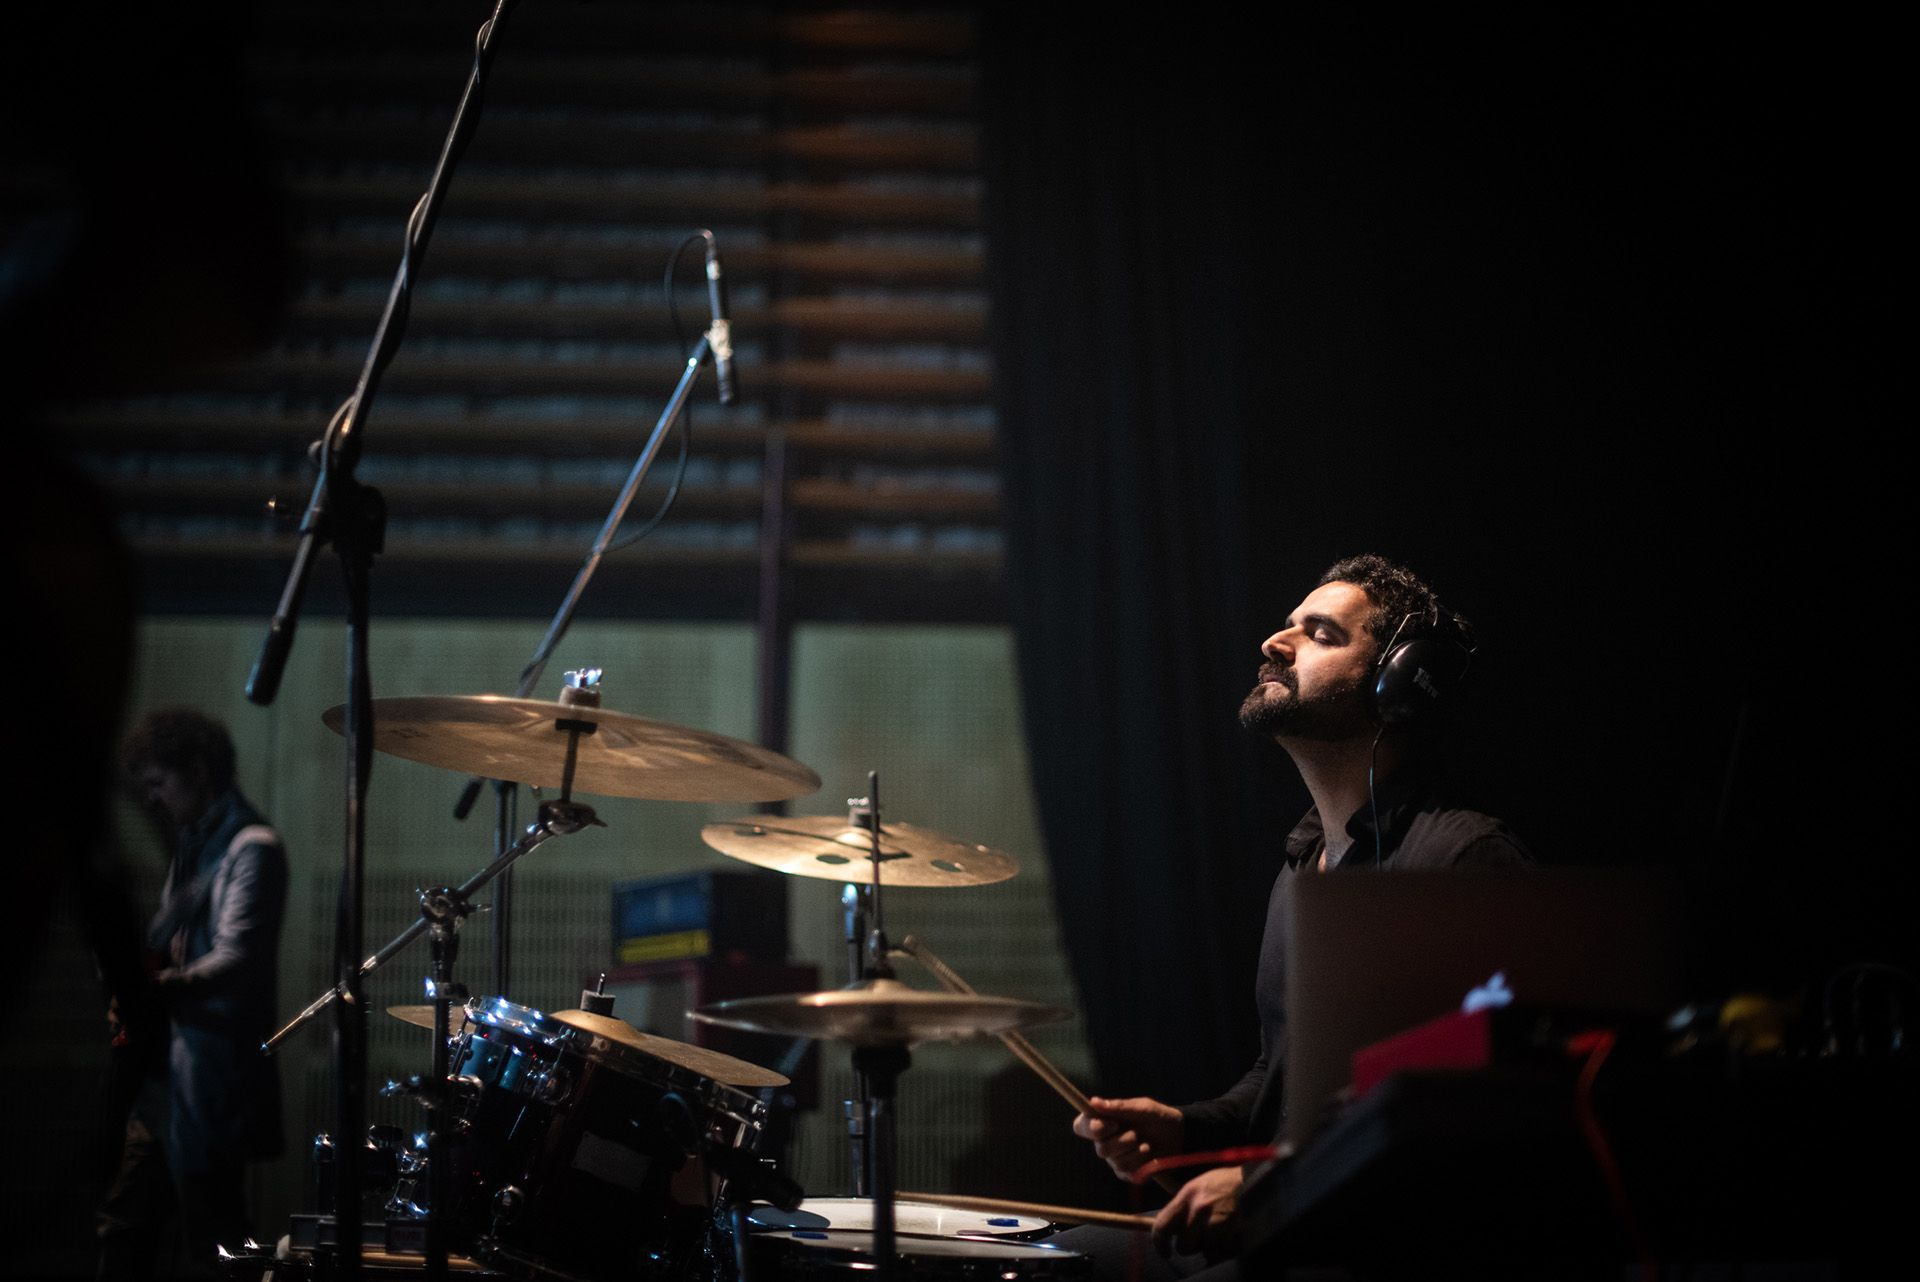 Yalal Yoma, baterista de la banda